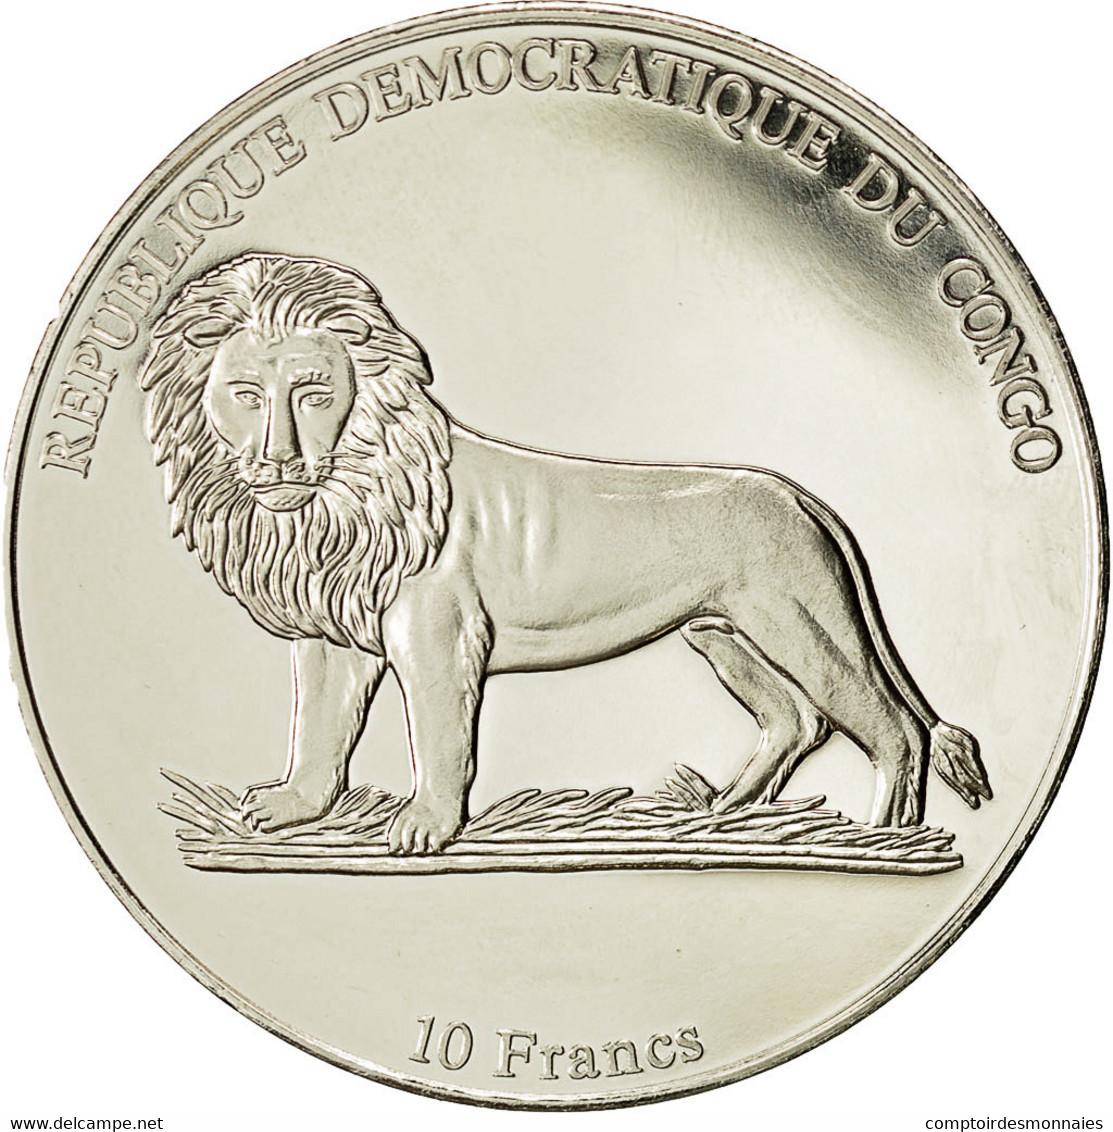 Monnaie, CONGO, DEMOCRATIC REPUBLIC, 10 Francs, 2002, FDC, Copper-nickel, KM:194 - Kongo (Dem. Republik 1998)